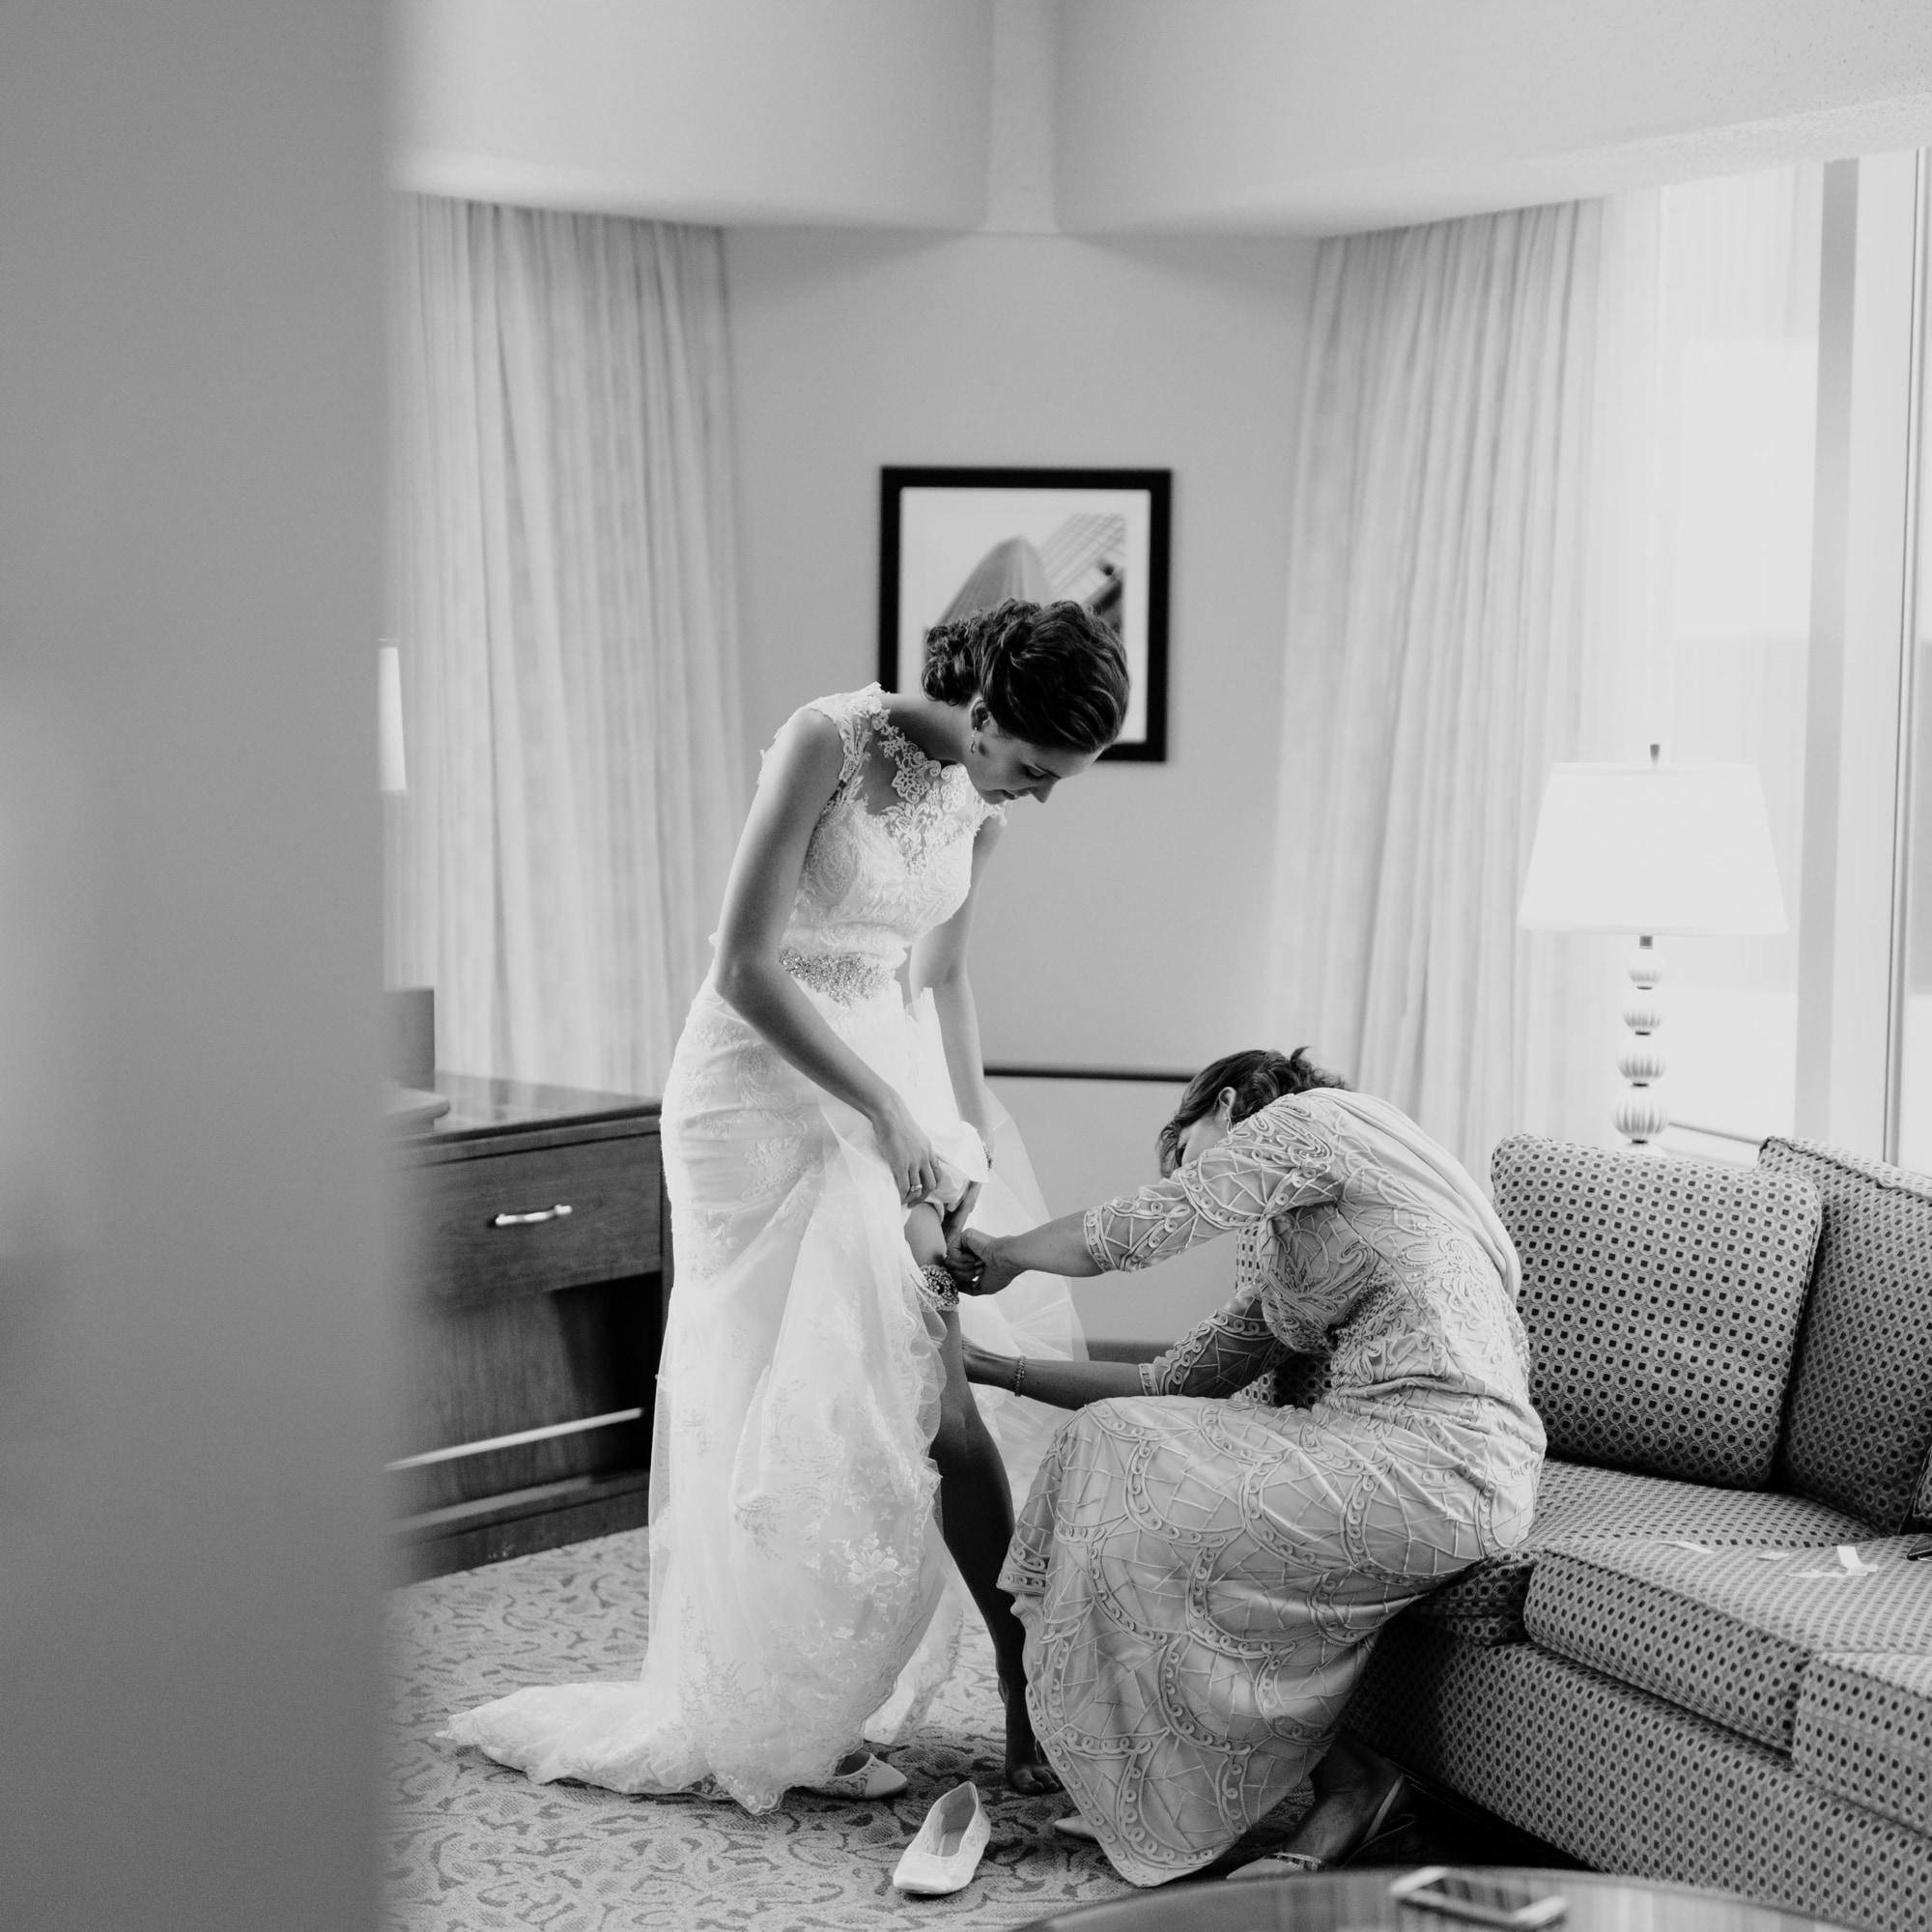 Nicollet-Island-Pavilion-Winter-Wedding-Minneapolis_10.jpg